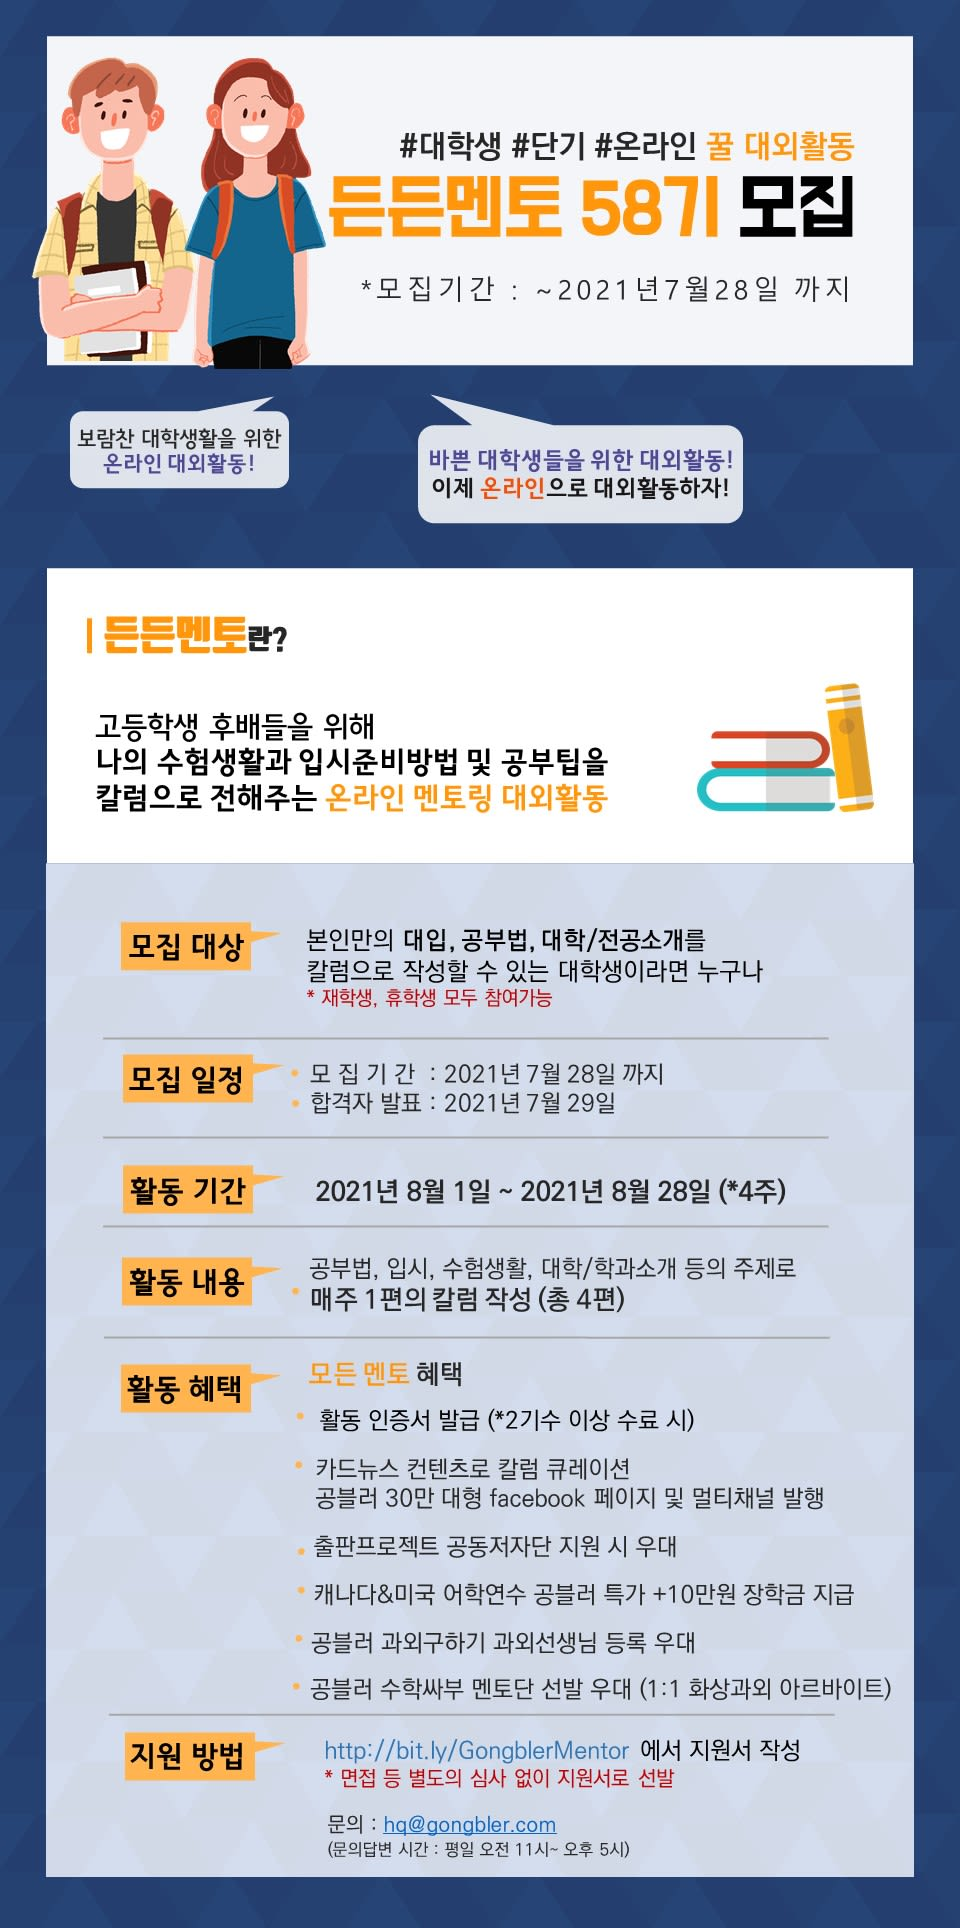 [HPGI] 단기 온라인 멘토링 대외활동, 든든멘토 58기 모집(~7/28)